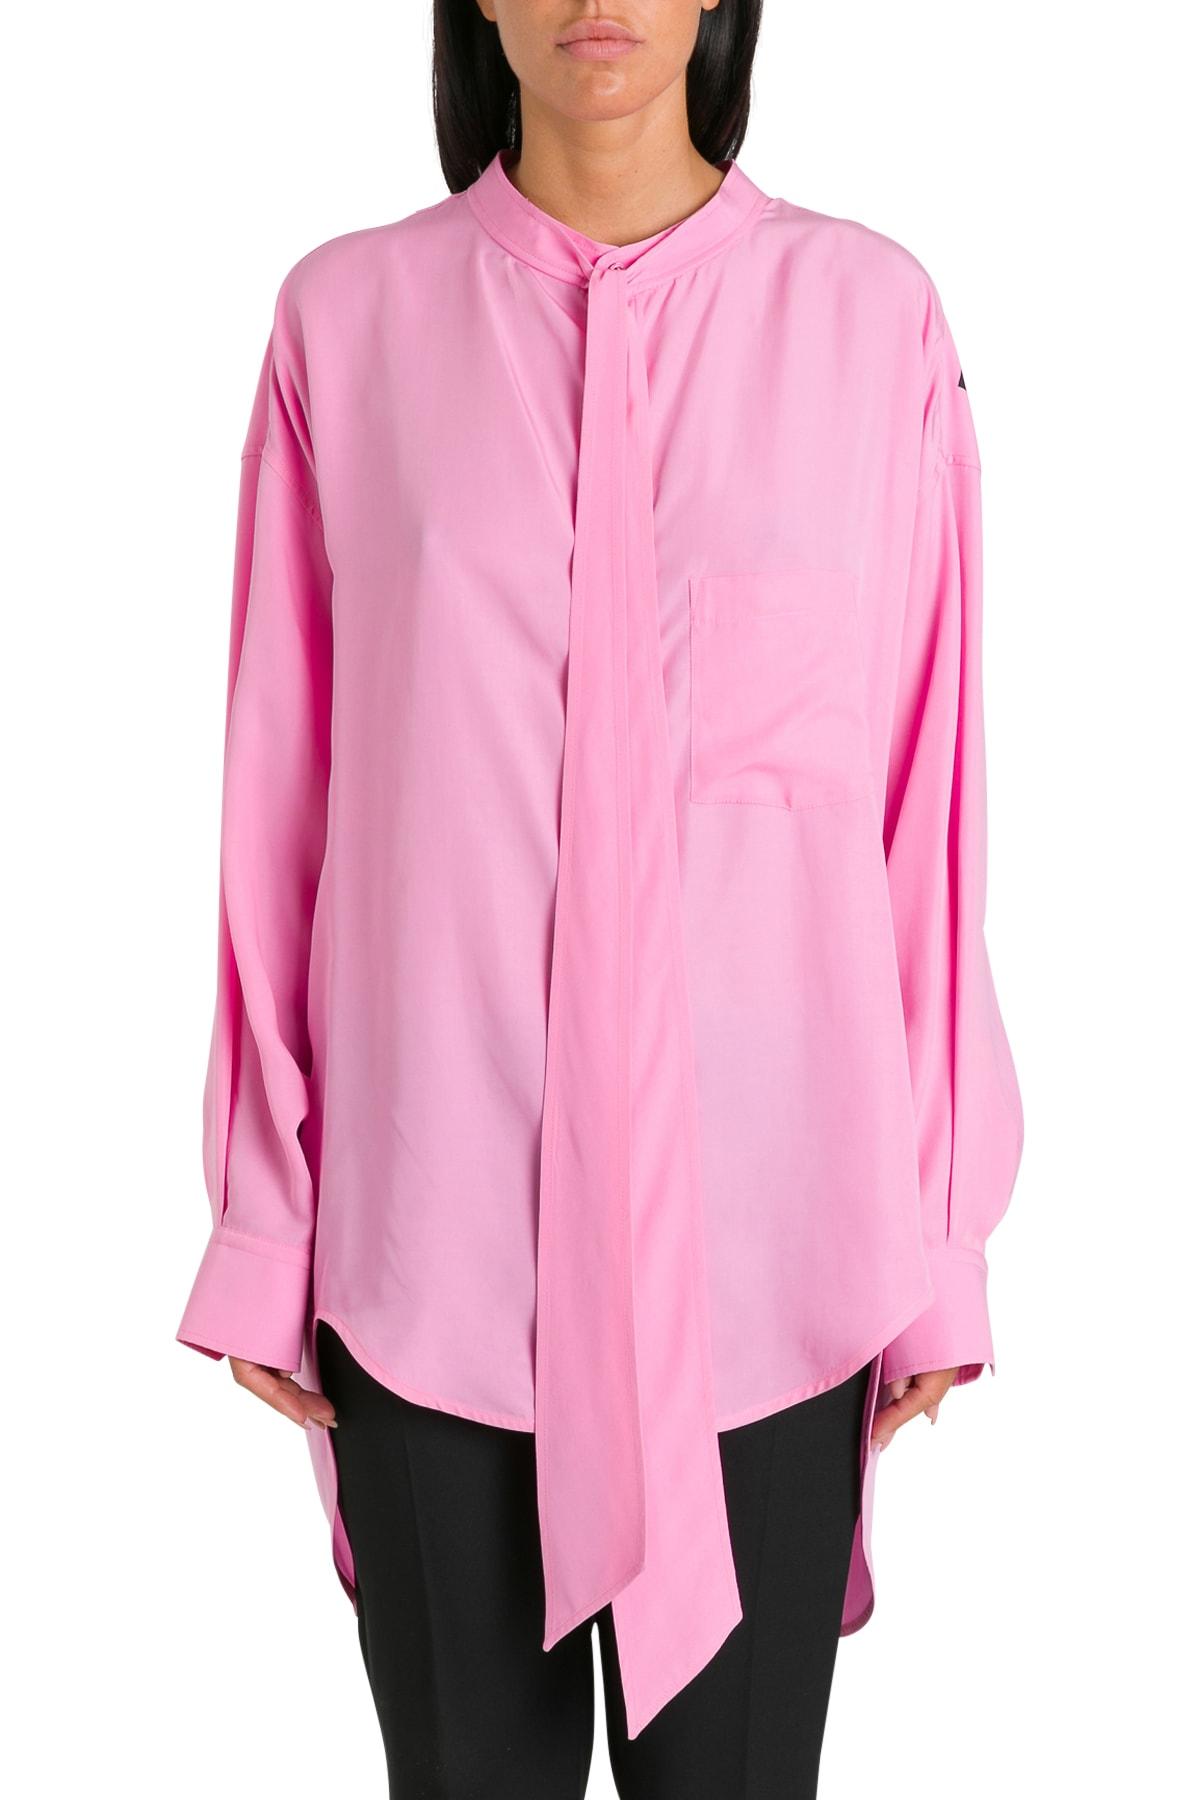 Balenciaga Oversized Shirt